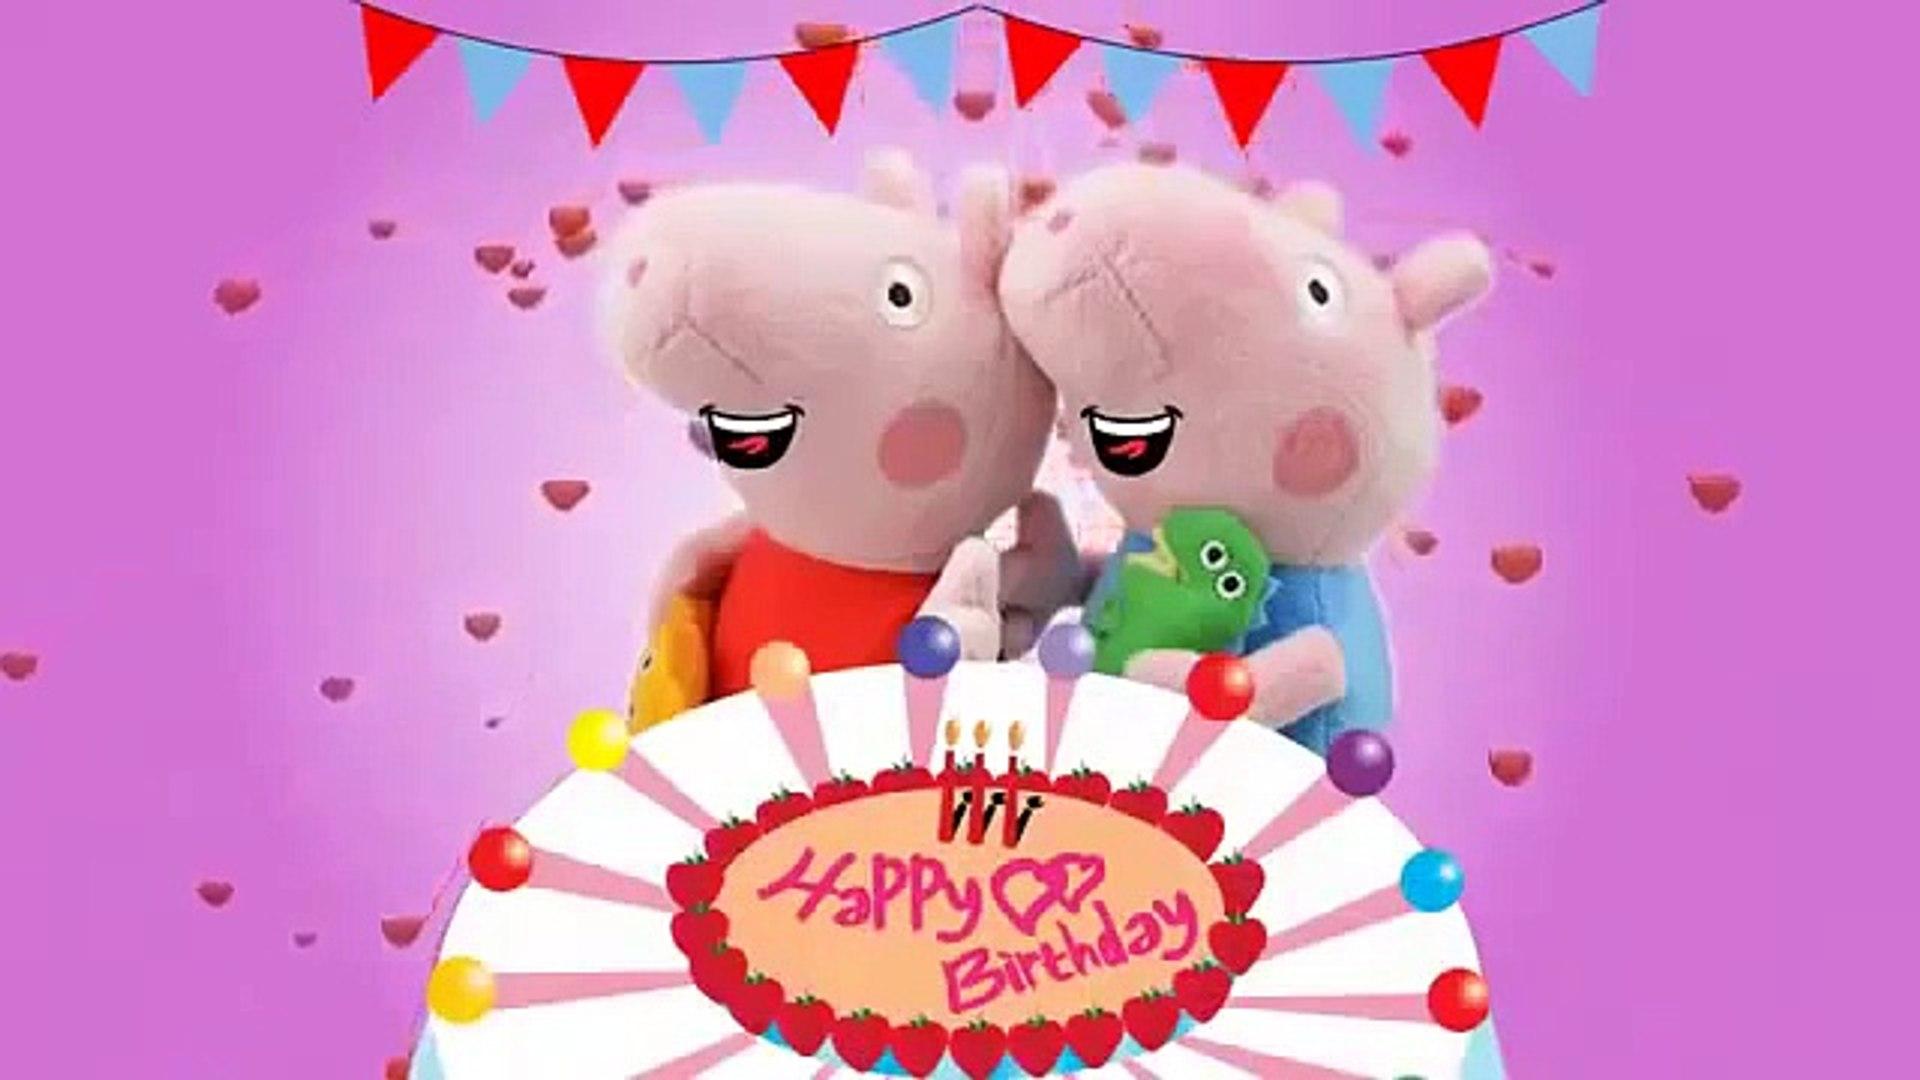 Peppa Pig Happy Birthday Amazon Co Uk Peppa Pig 9780241309049 Books